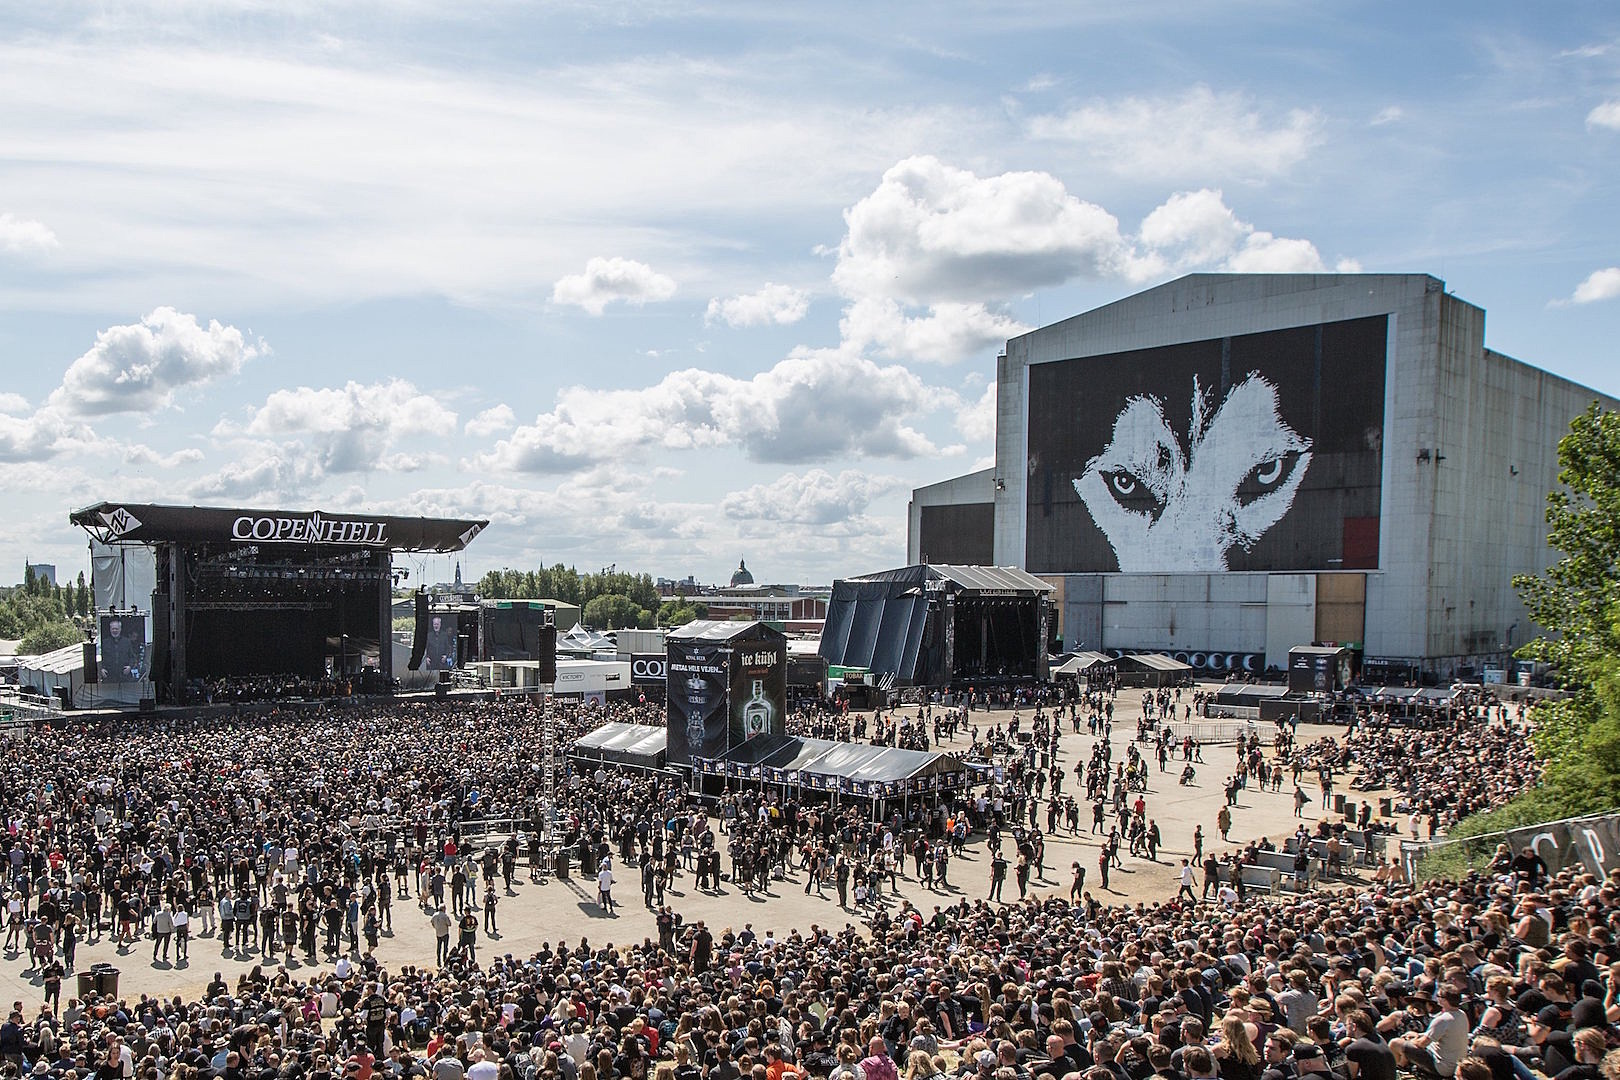 Copenhell Metal Festival Venue Taken Over by Church in Denmark